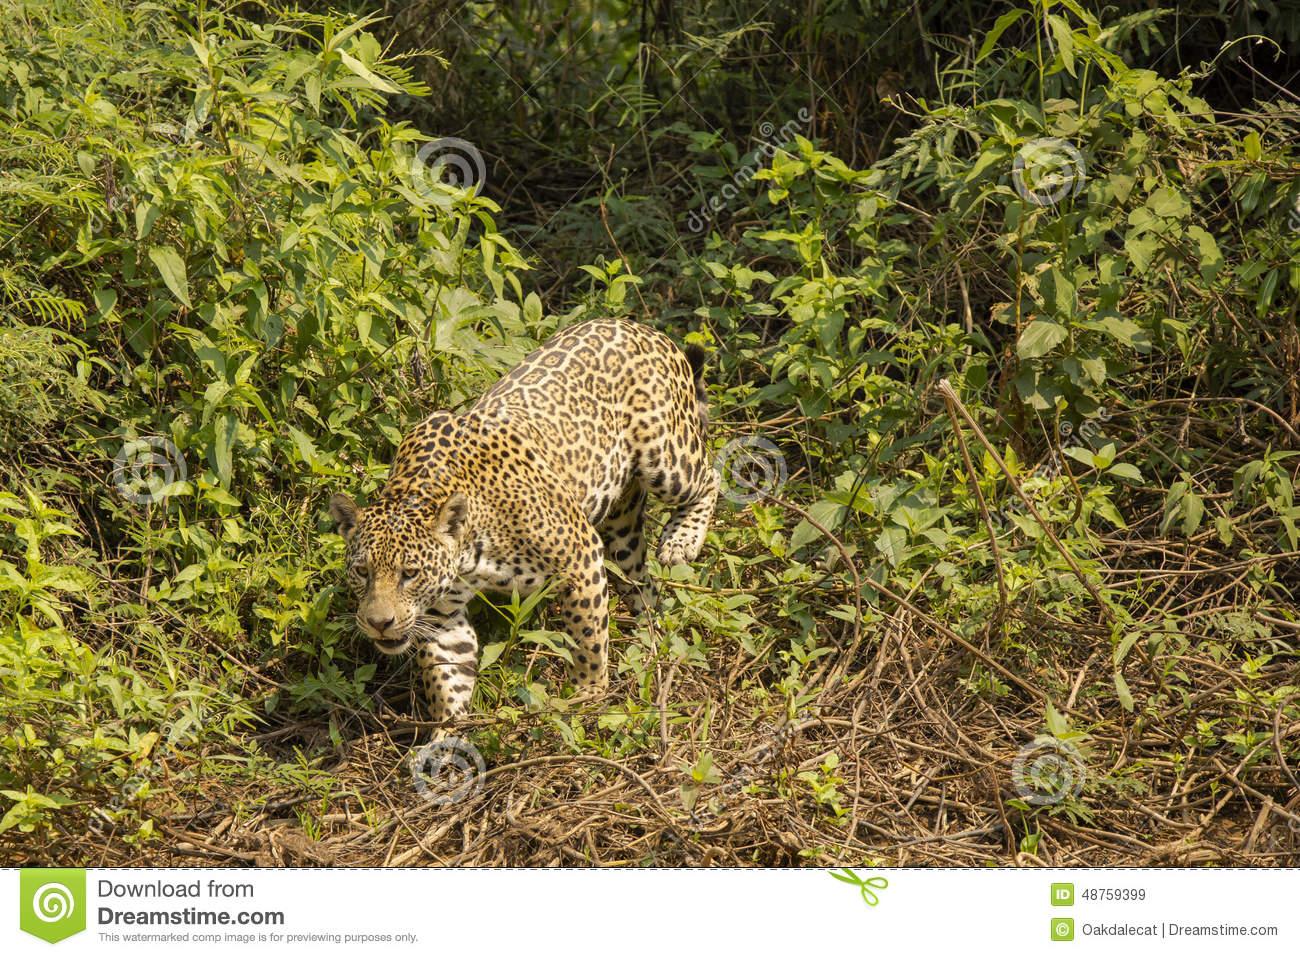 Wild Jaguar Stepping Through Bushes Vines Stock Photo.